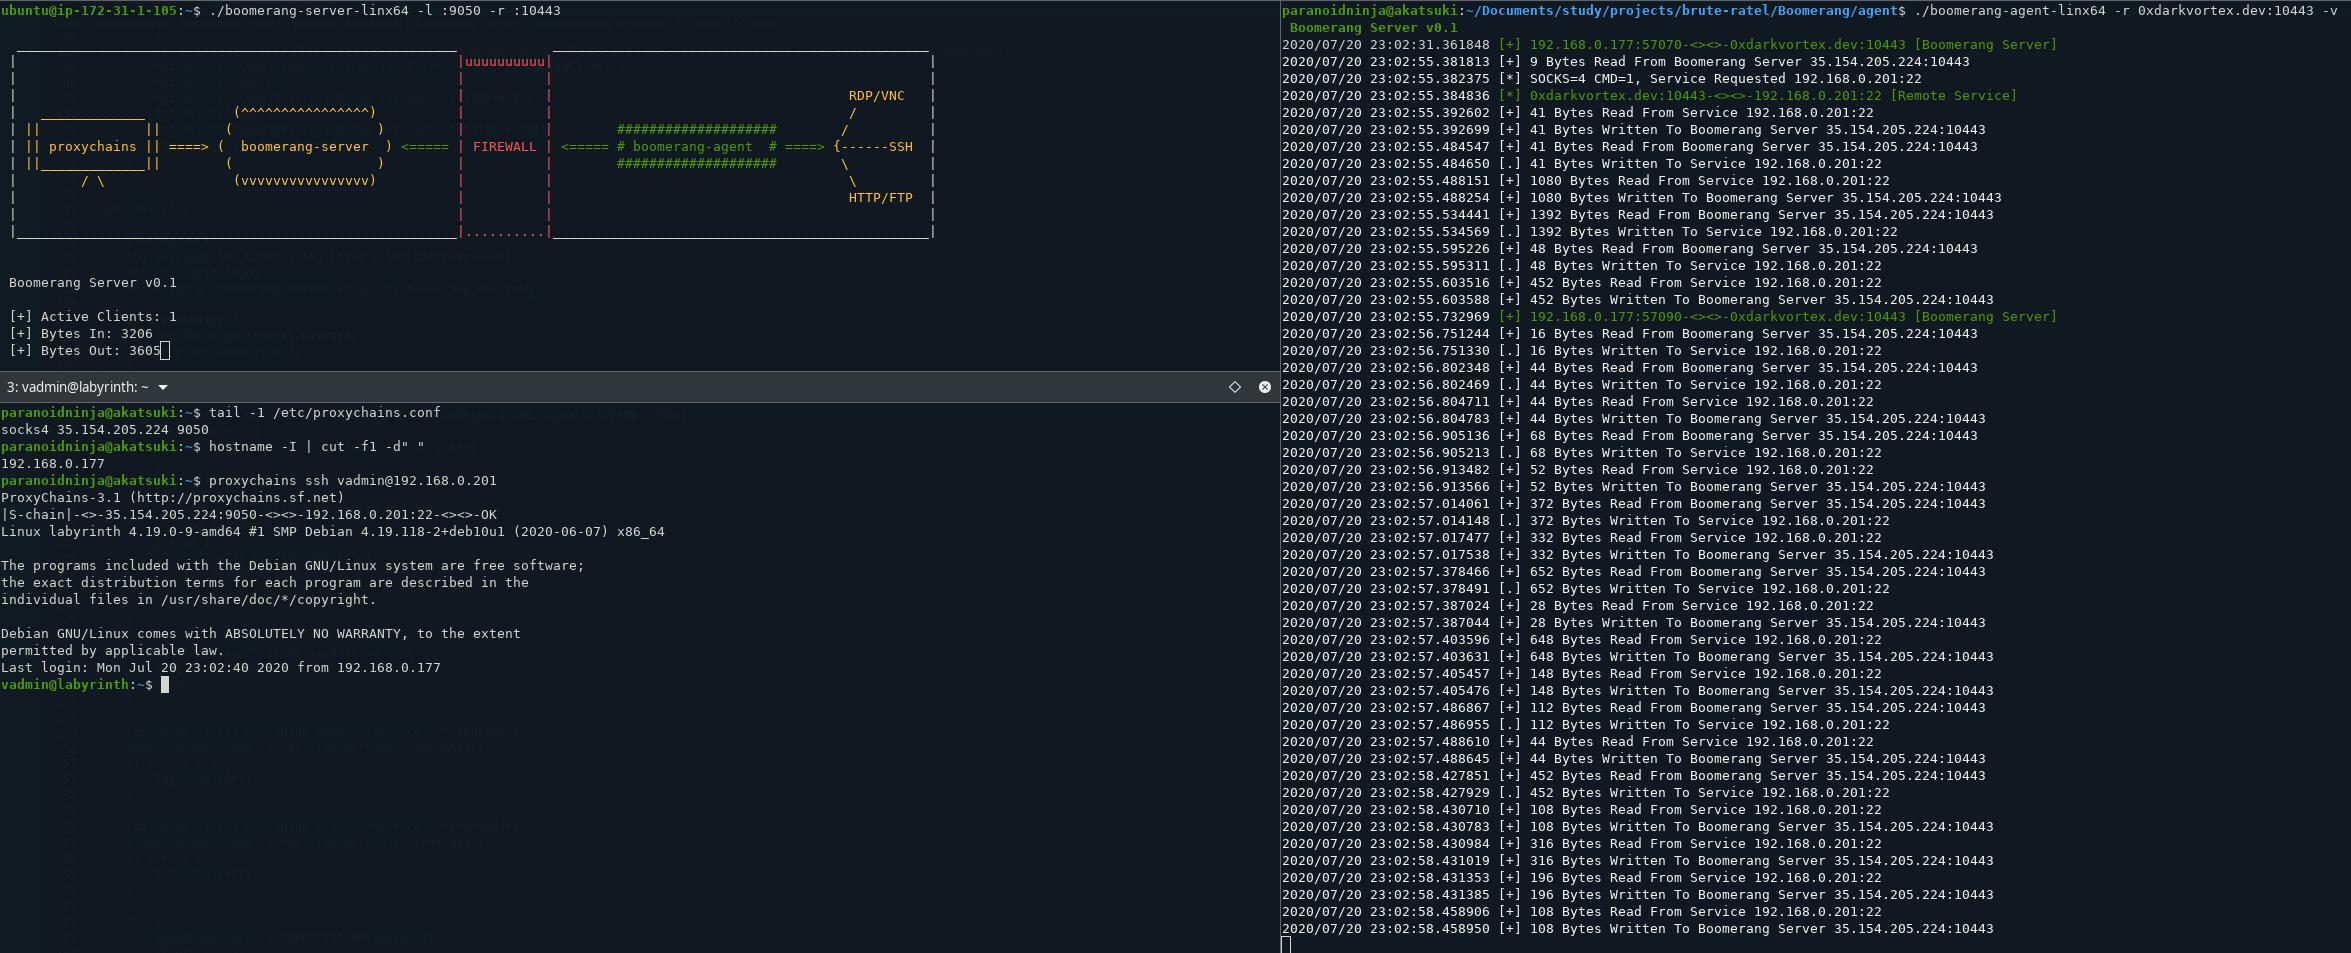 Boomerang - expose multiple internal servers to web/cloud